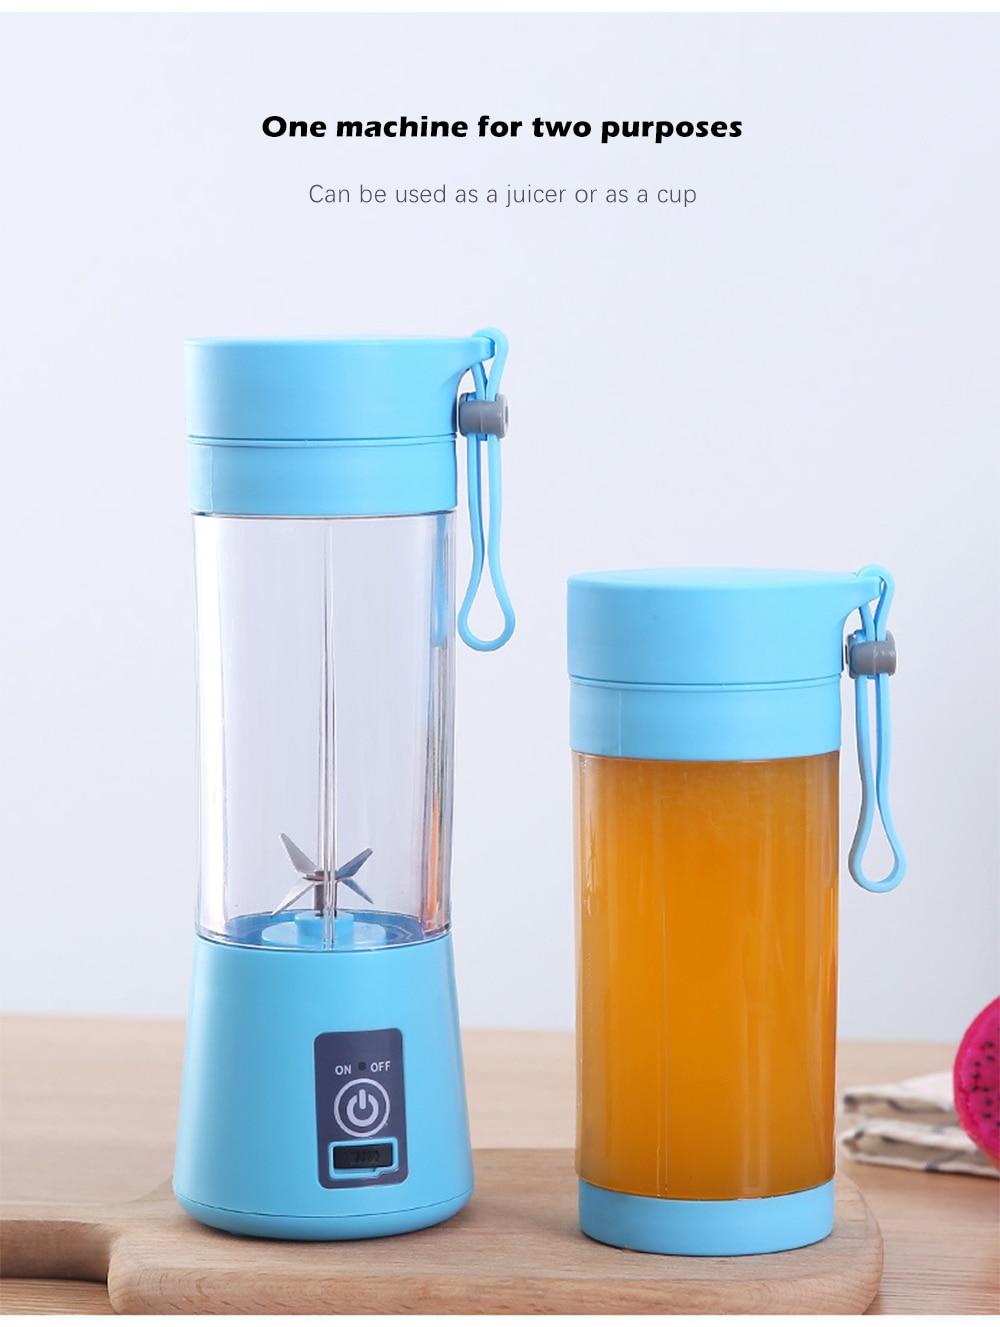 HTB1rKcKS4YaK1RjSZFnq6y80pXaF 380ml 2/4/6 Blades Mini Portable Electric Fruit Juicer USB Rechargeable Smoothie Maker Blender Machine Sports Bottle Juicing Cup